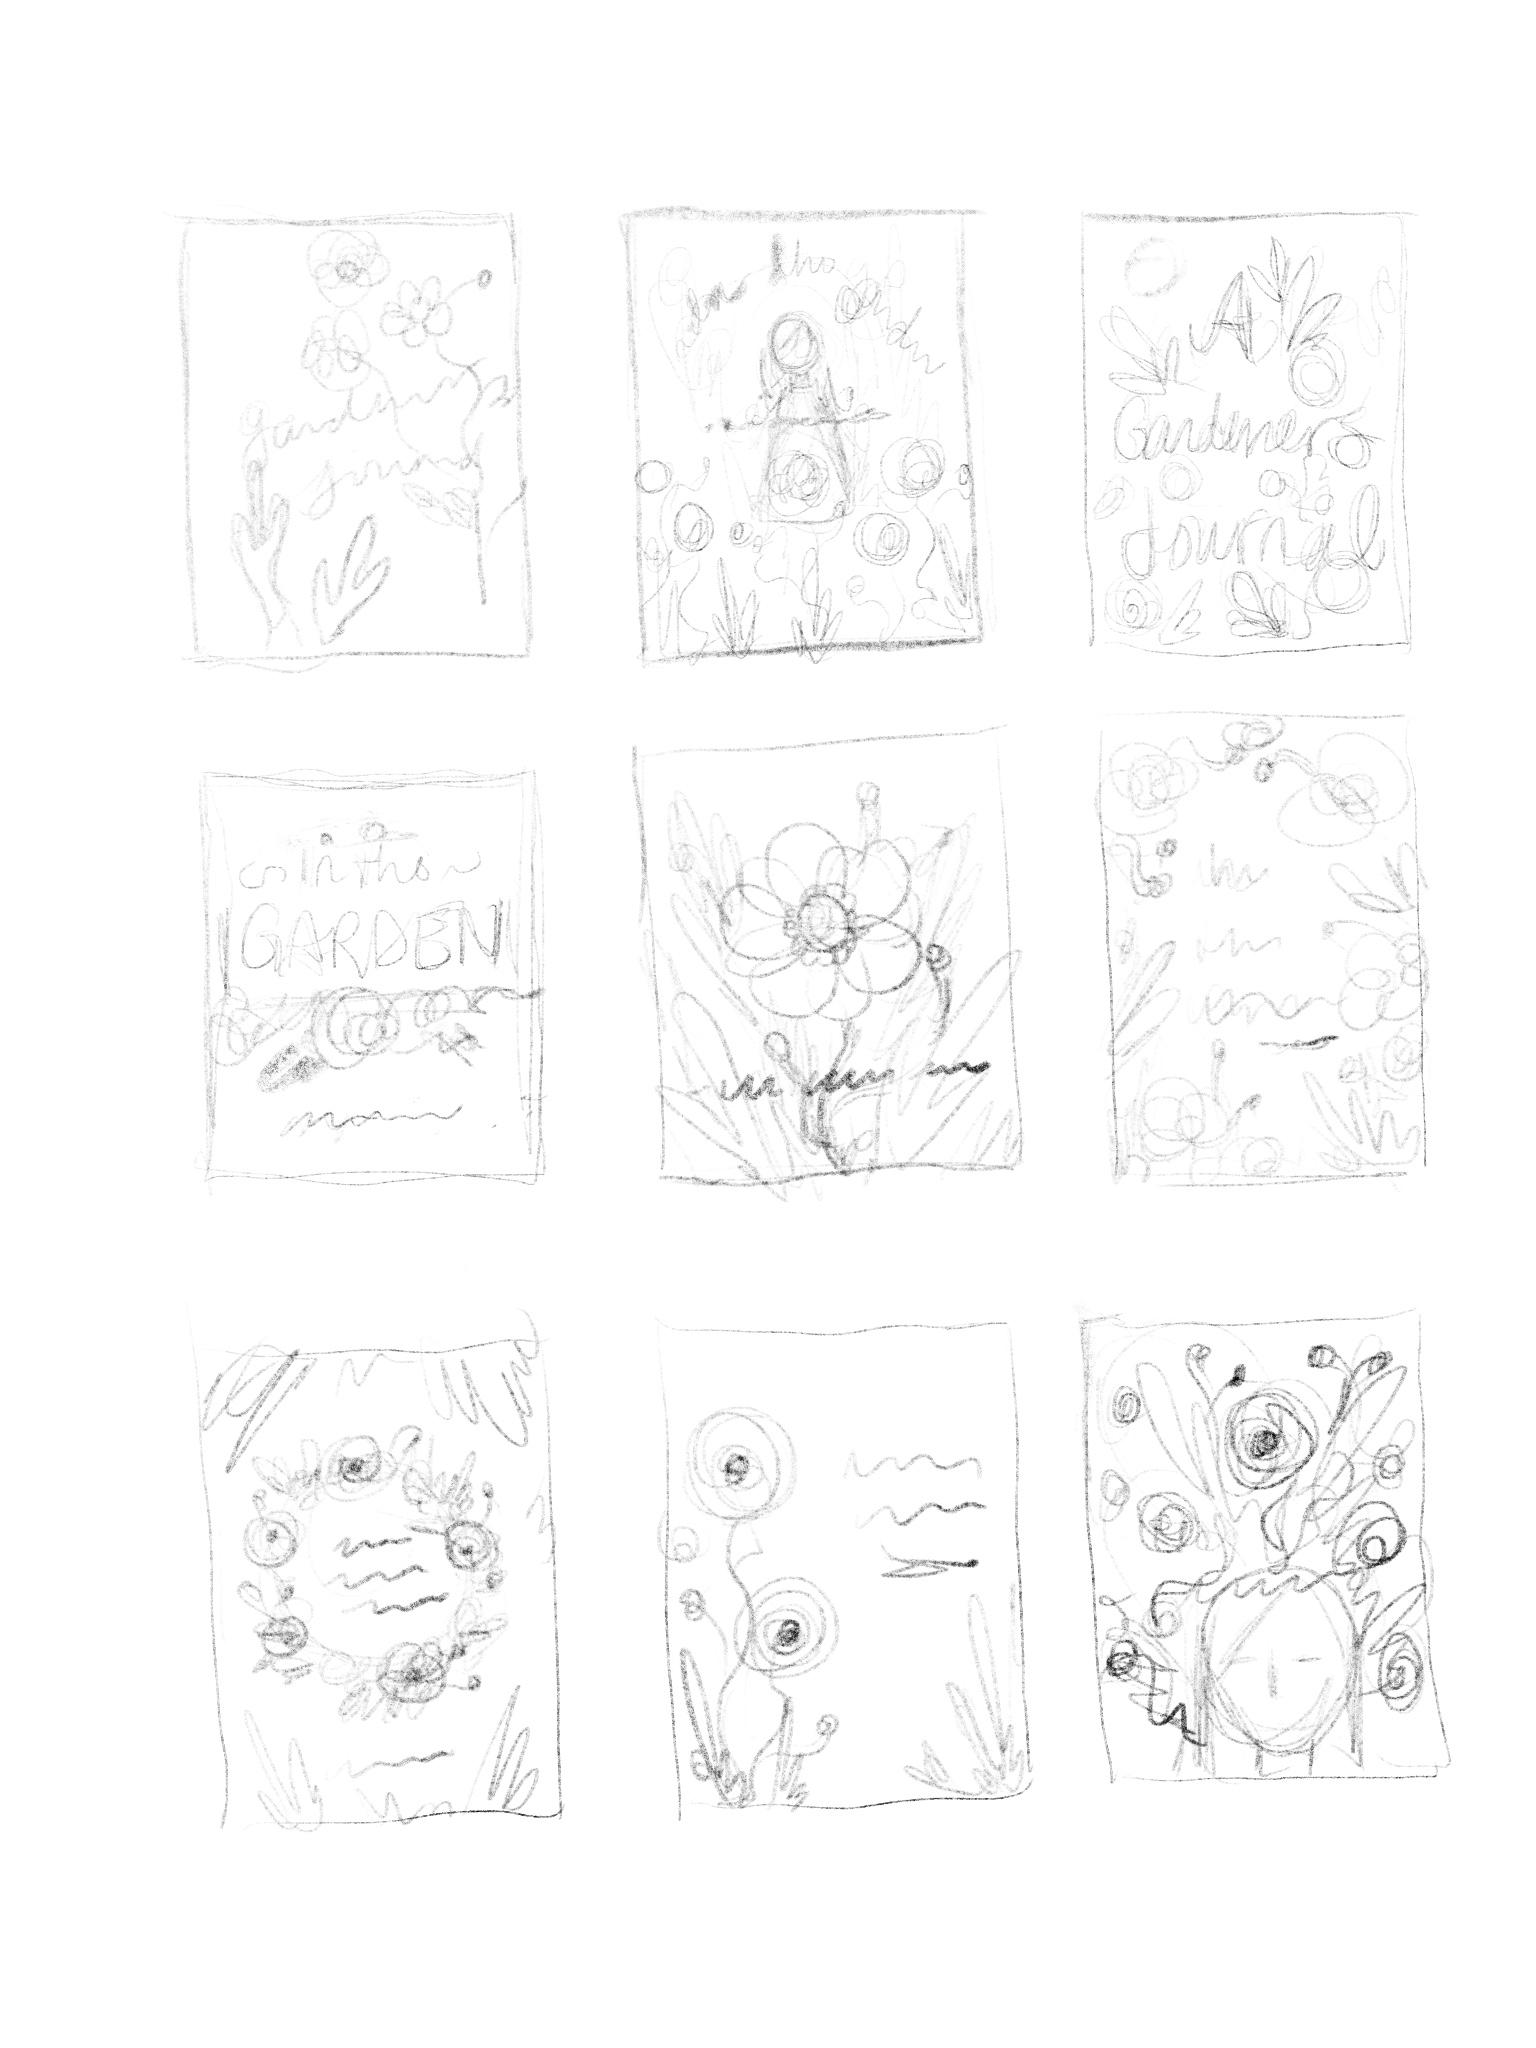 GTS18_thumbnails.JPG